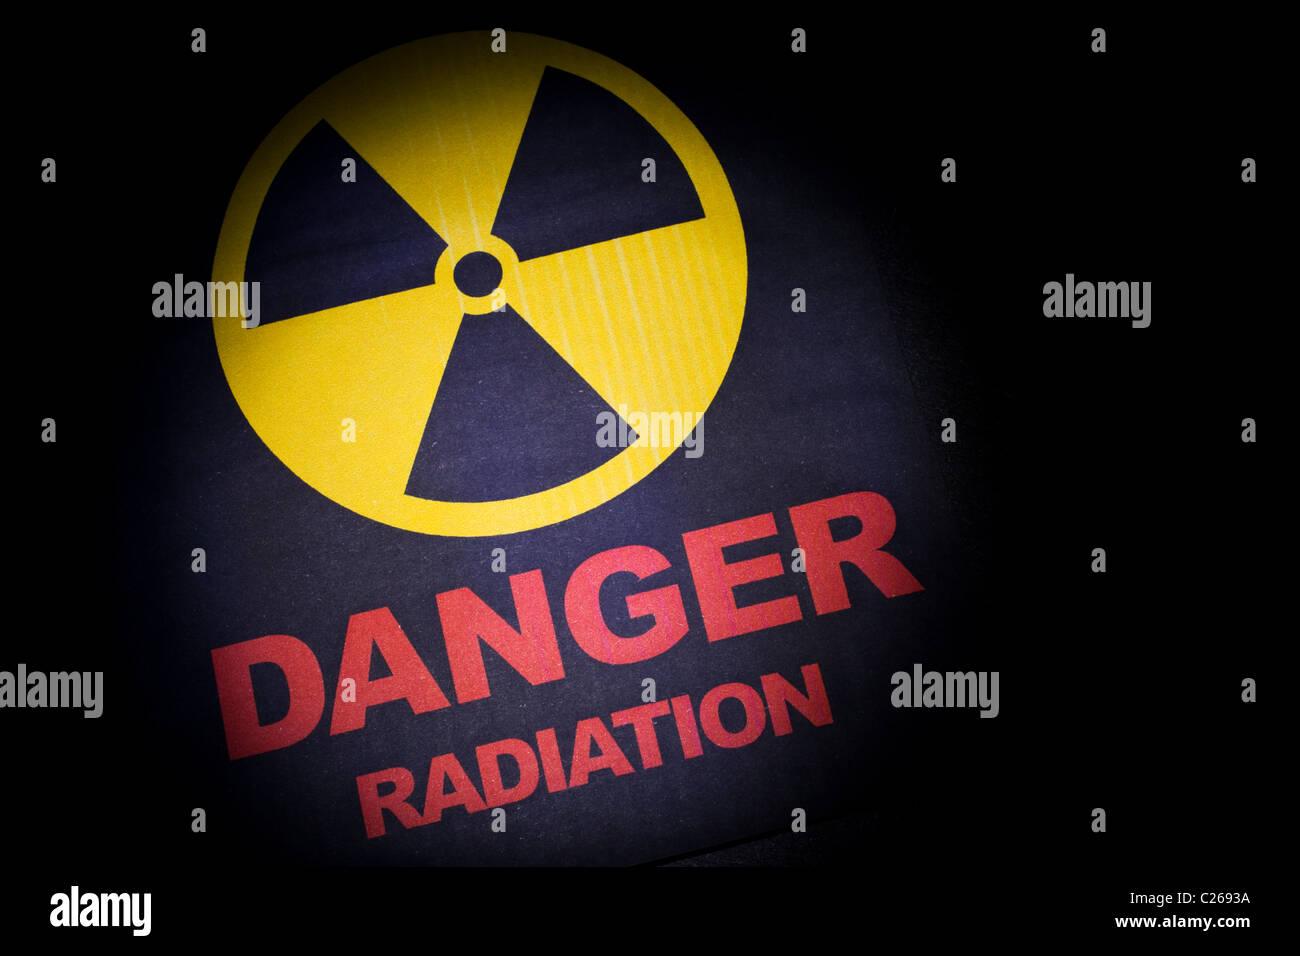 Radiation hazard sign for background Stock Photo